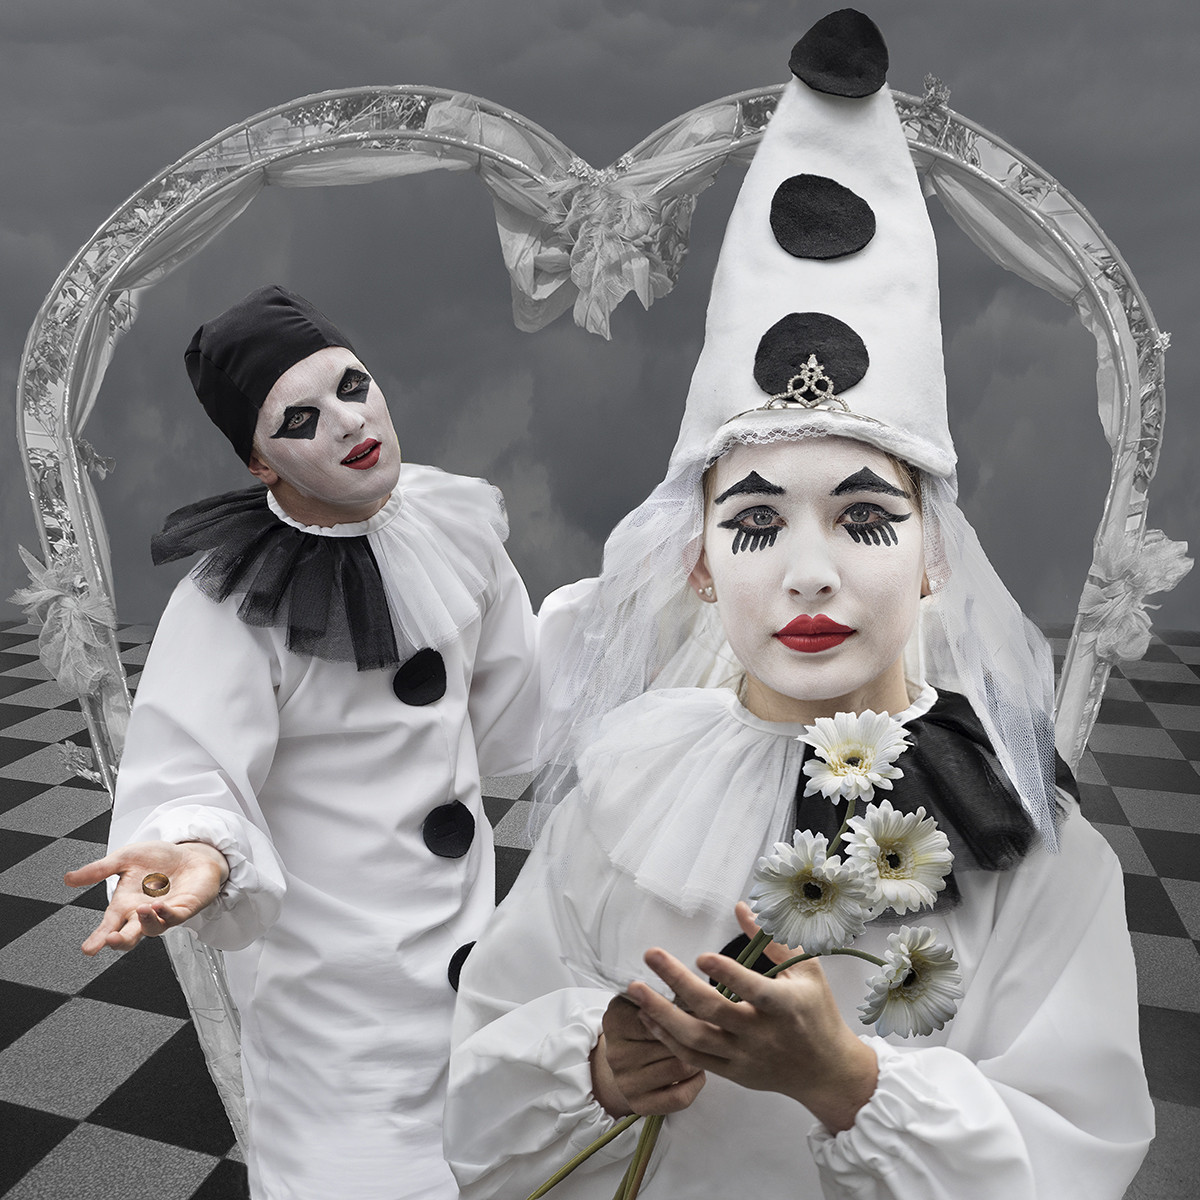 PDI - The Wedding by Wanda Mackie (20 marks)